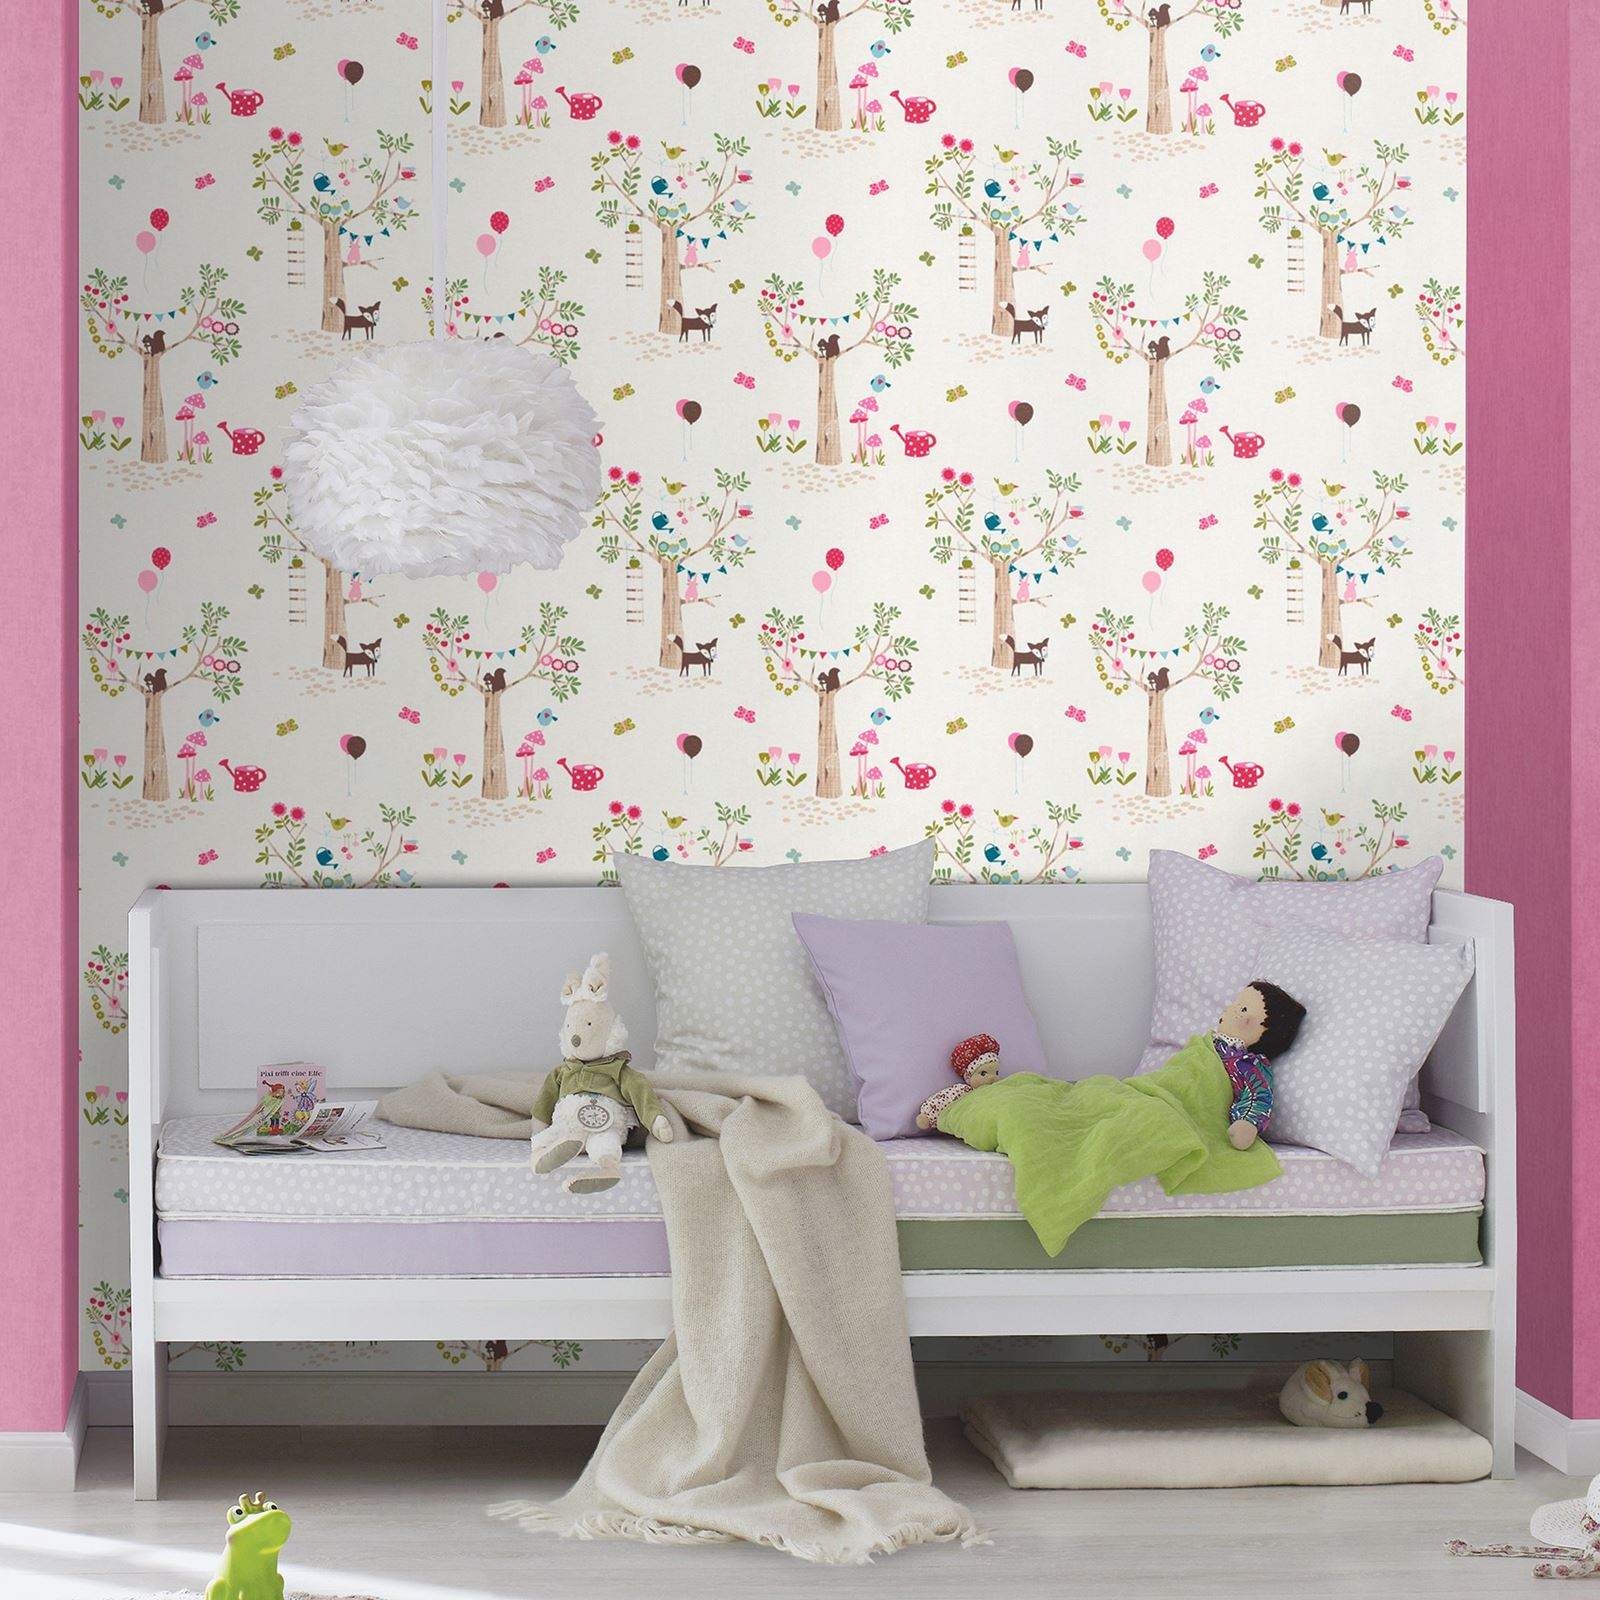 details about woodland animals wallpaper borders bedroom nurser